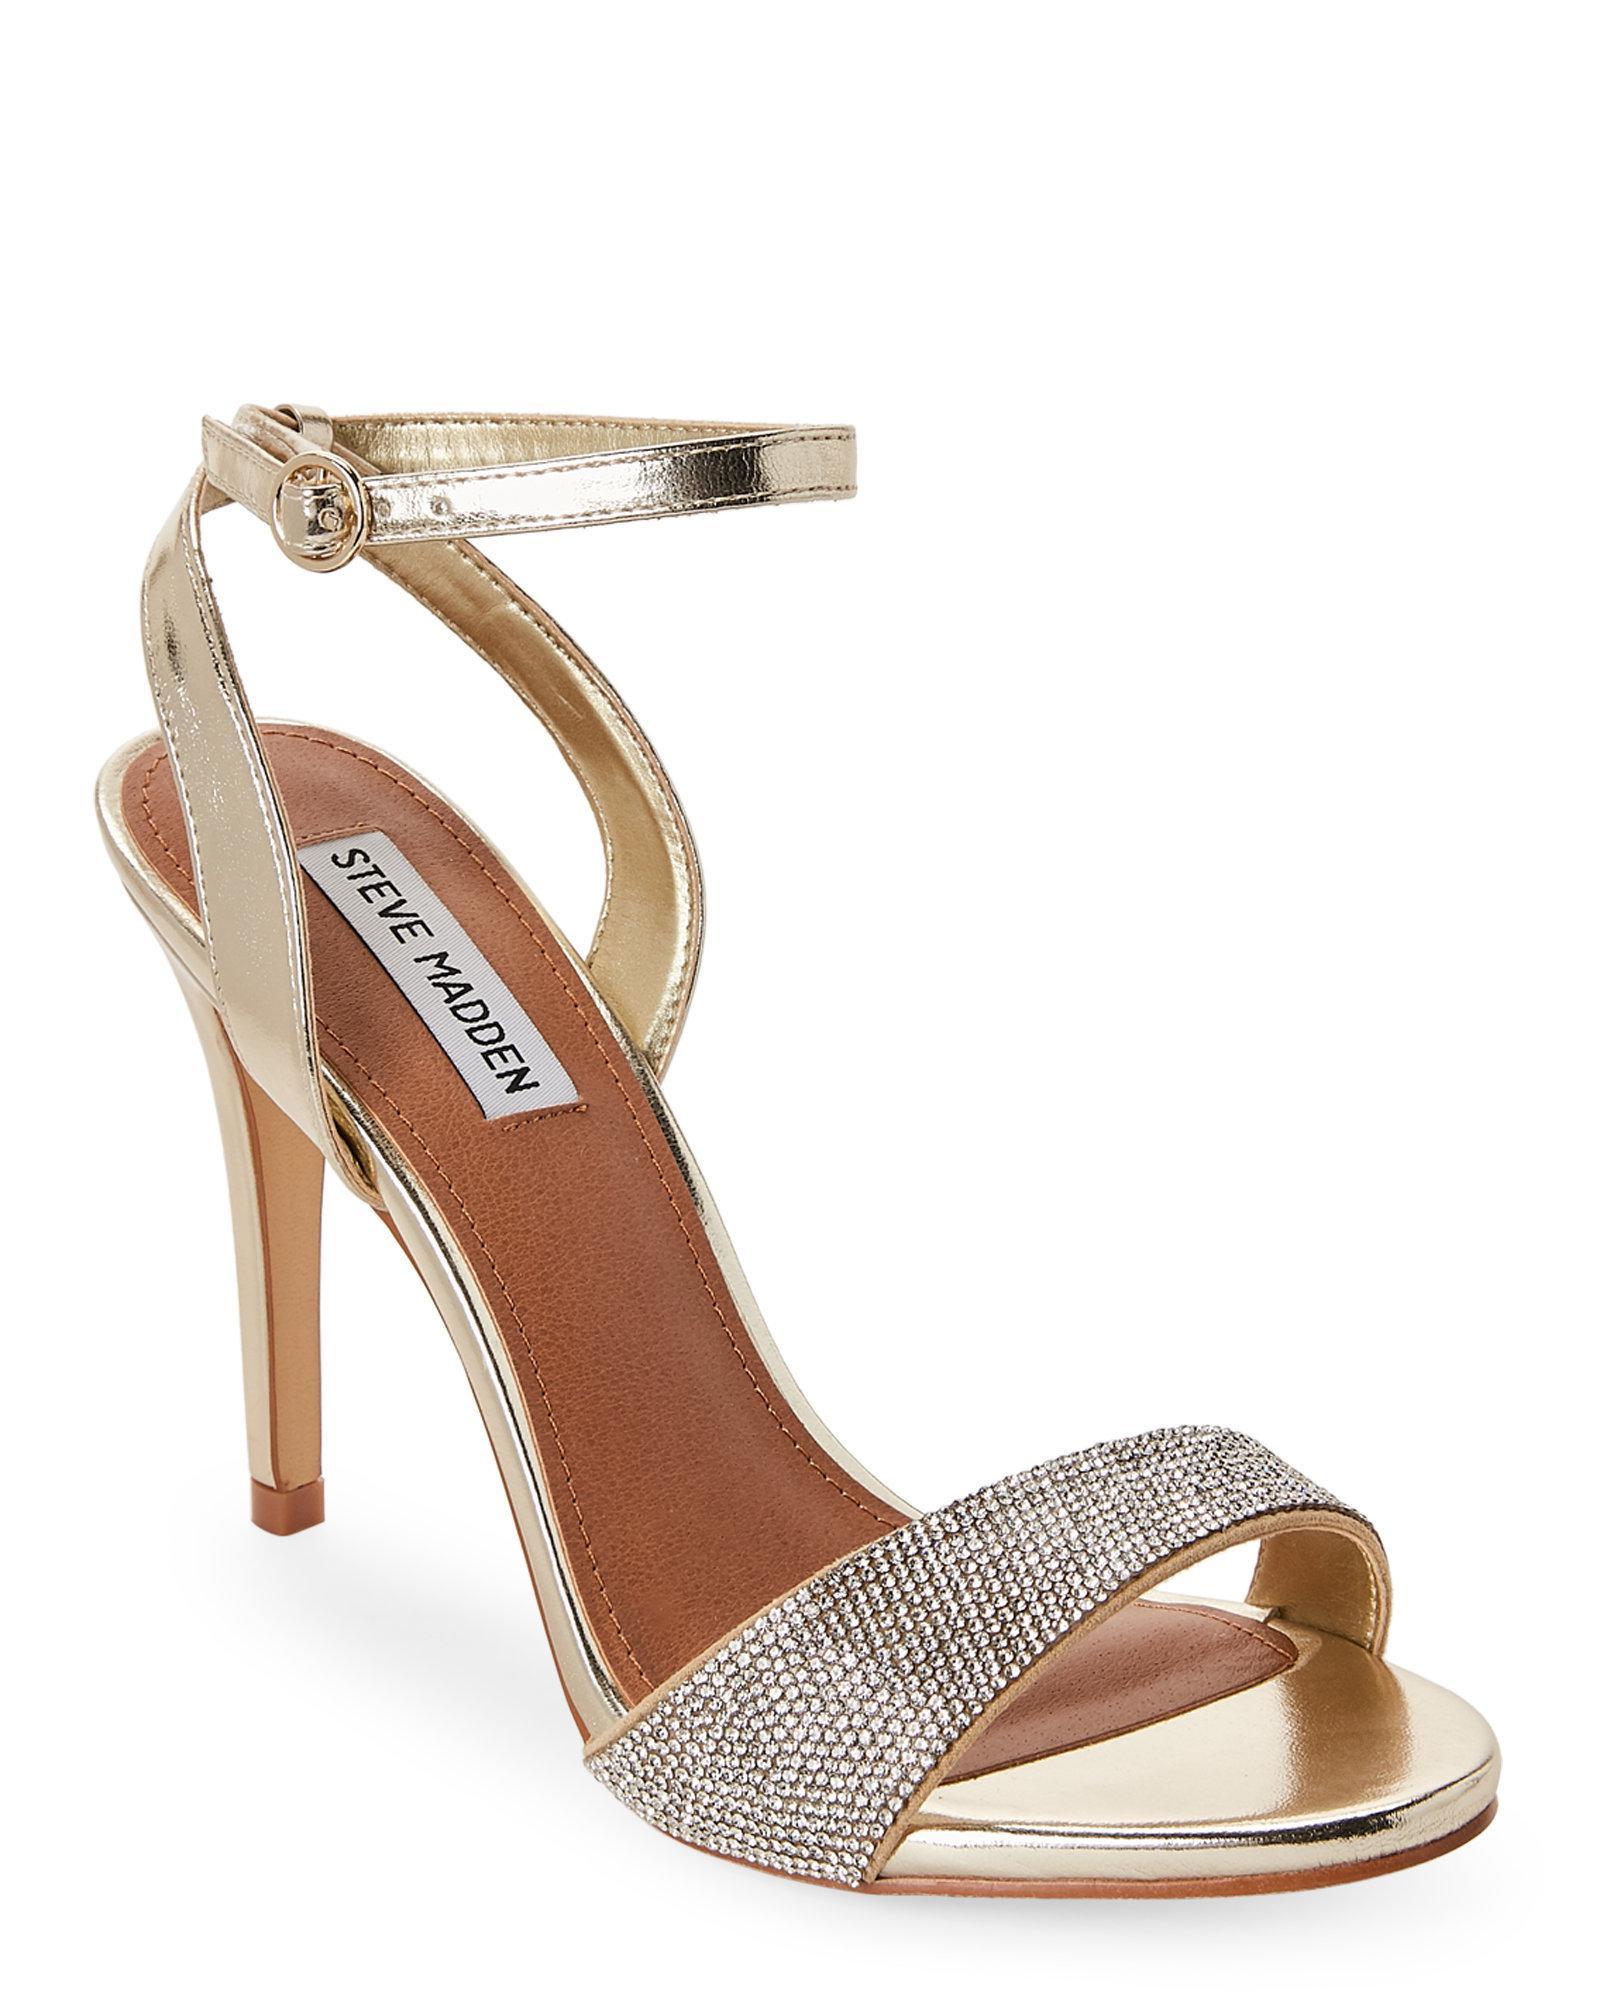 894701554766 Lyst - Steve Madden Gold Ritter Rhinestone Sandals in Metallic